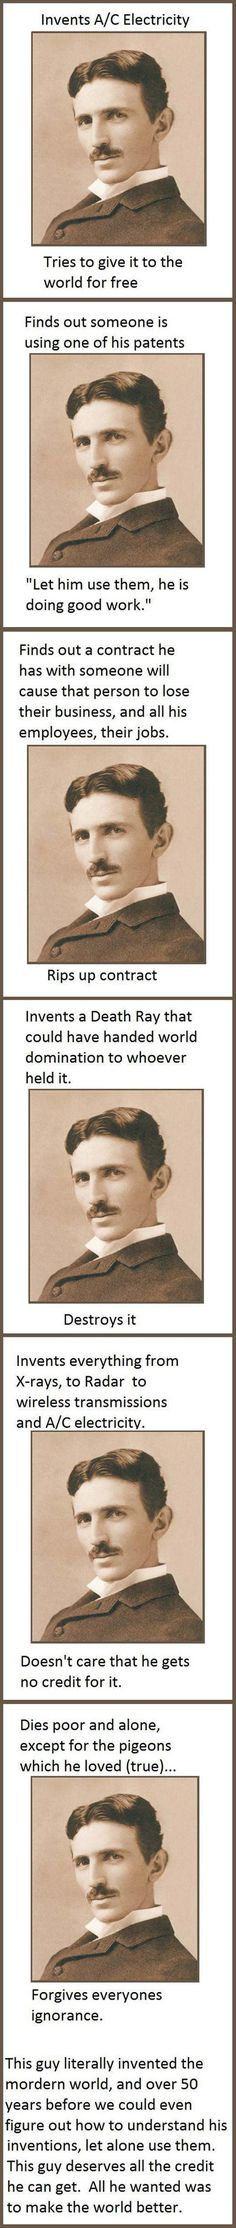 Tesla Was A Good Guy